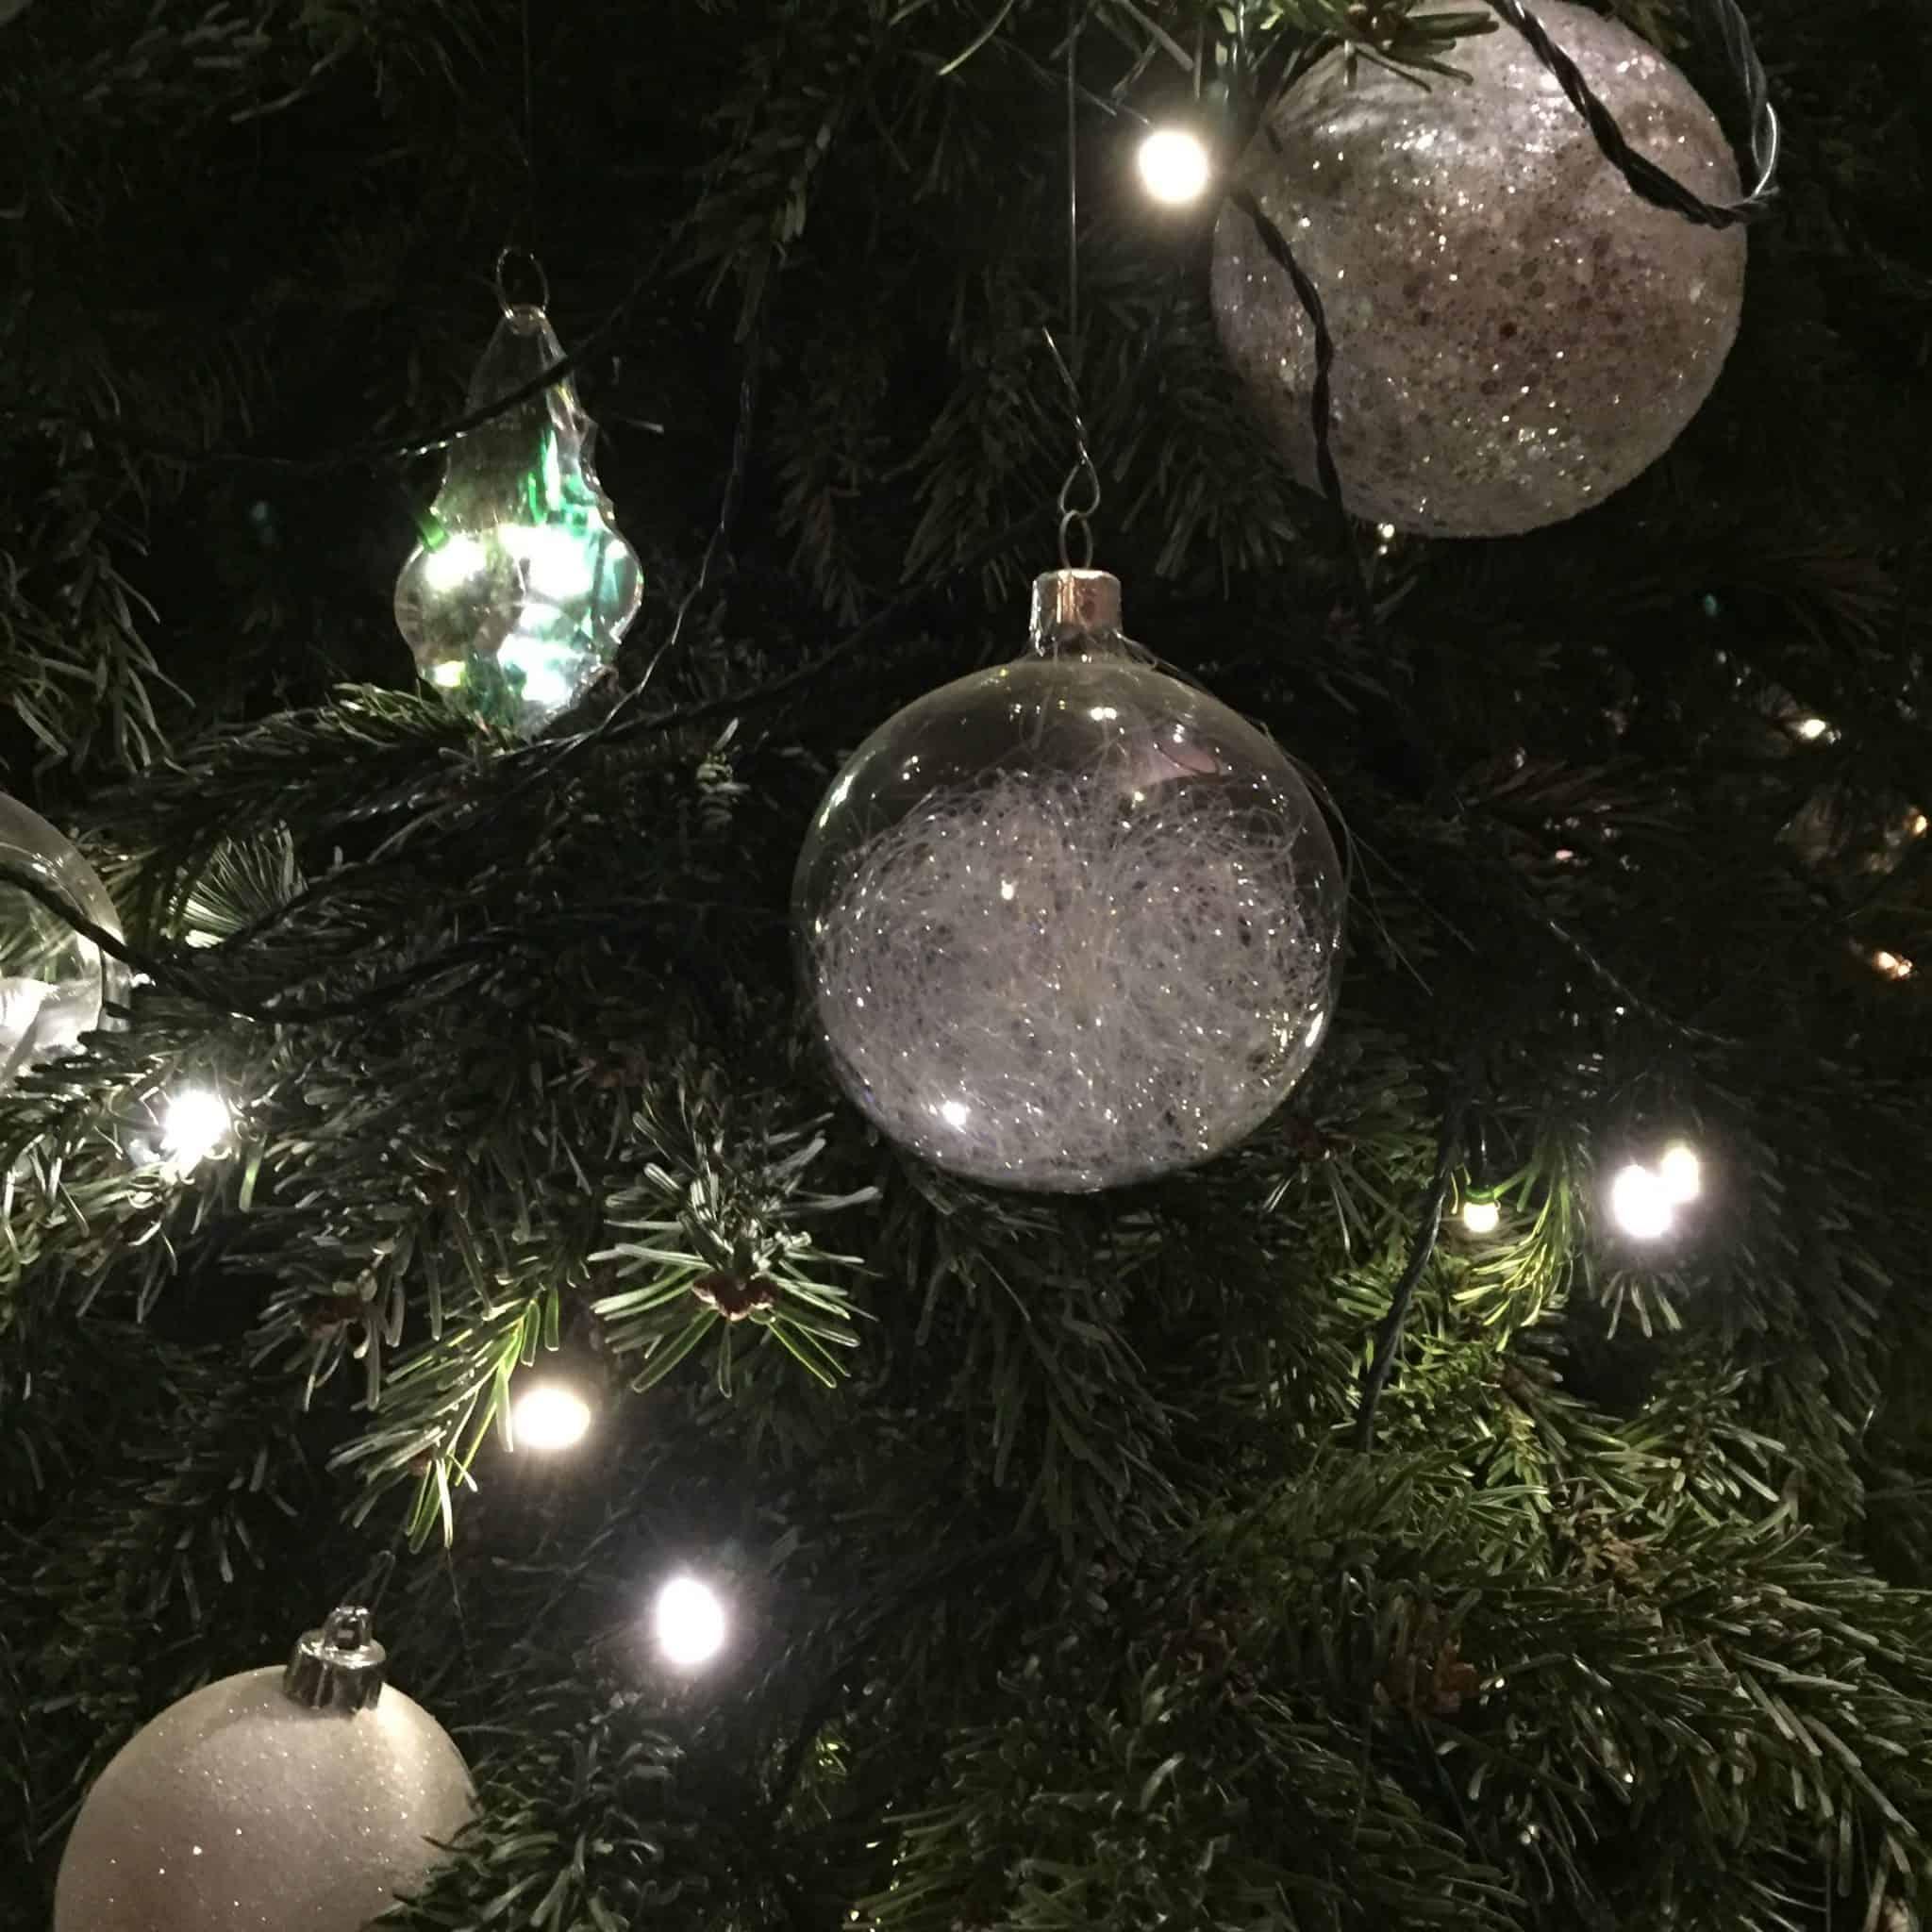 Christmas tree decorations at Waddesdon Manor